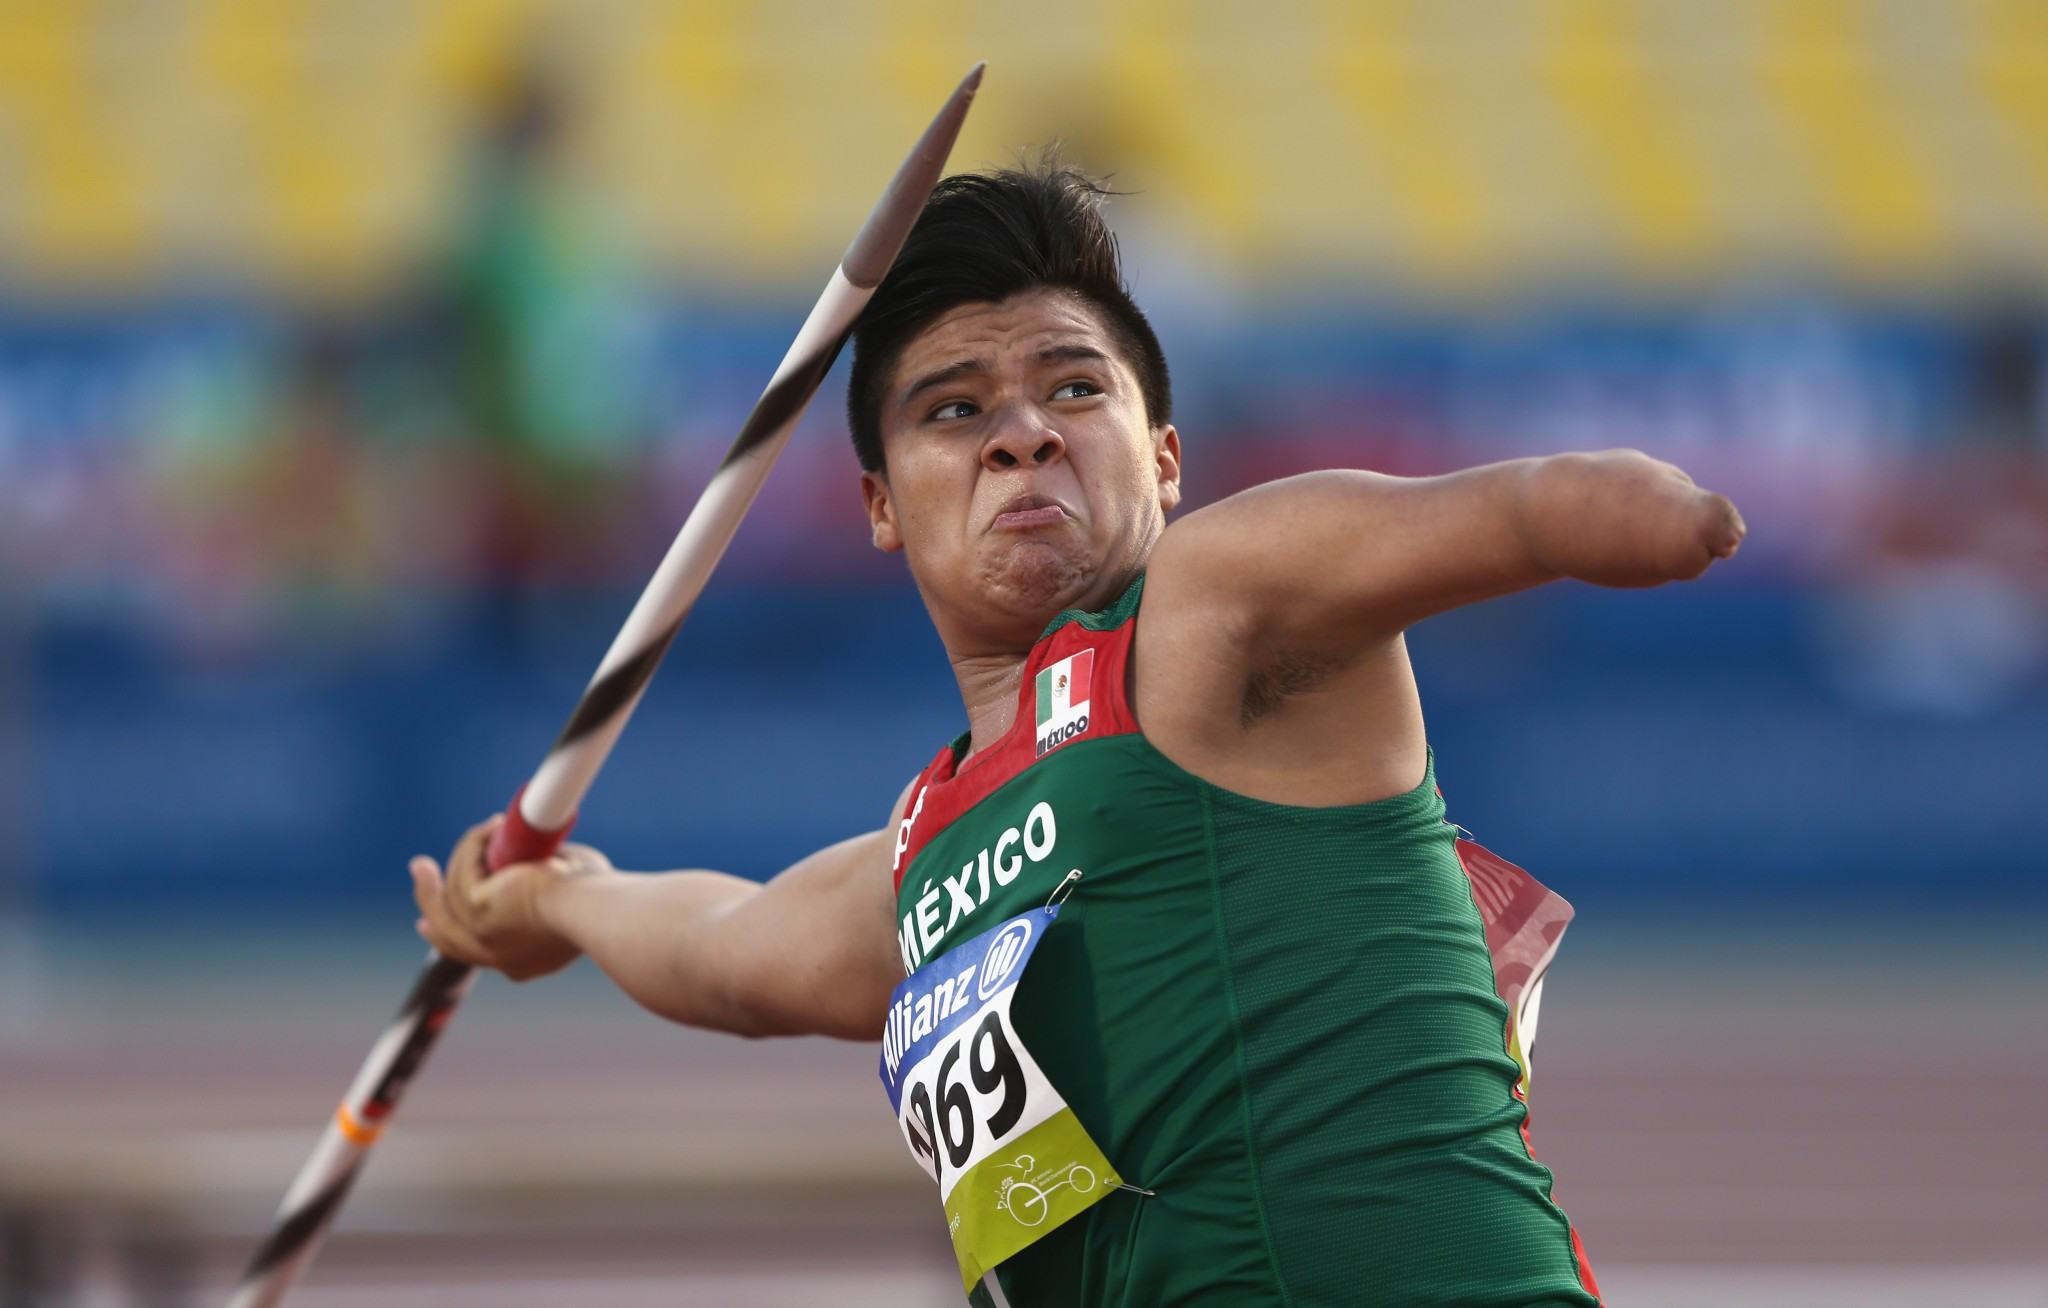 Parapan champion Buenaventura wins World Para Athletics Junior Championships gold on final day